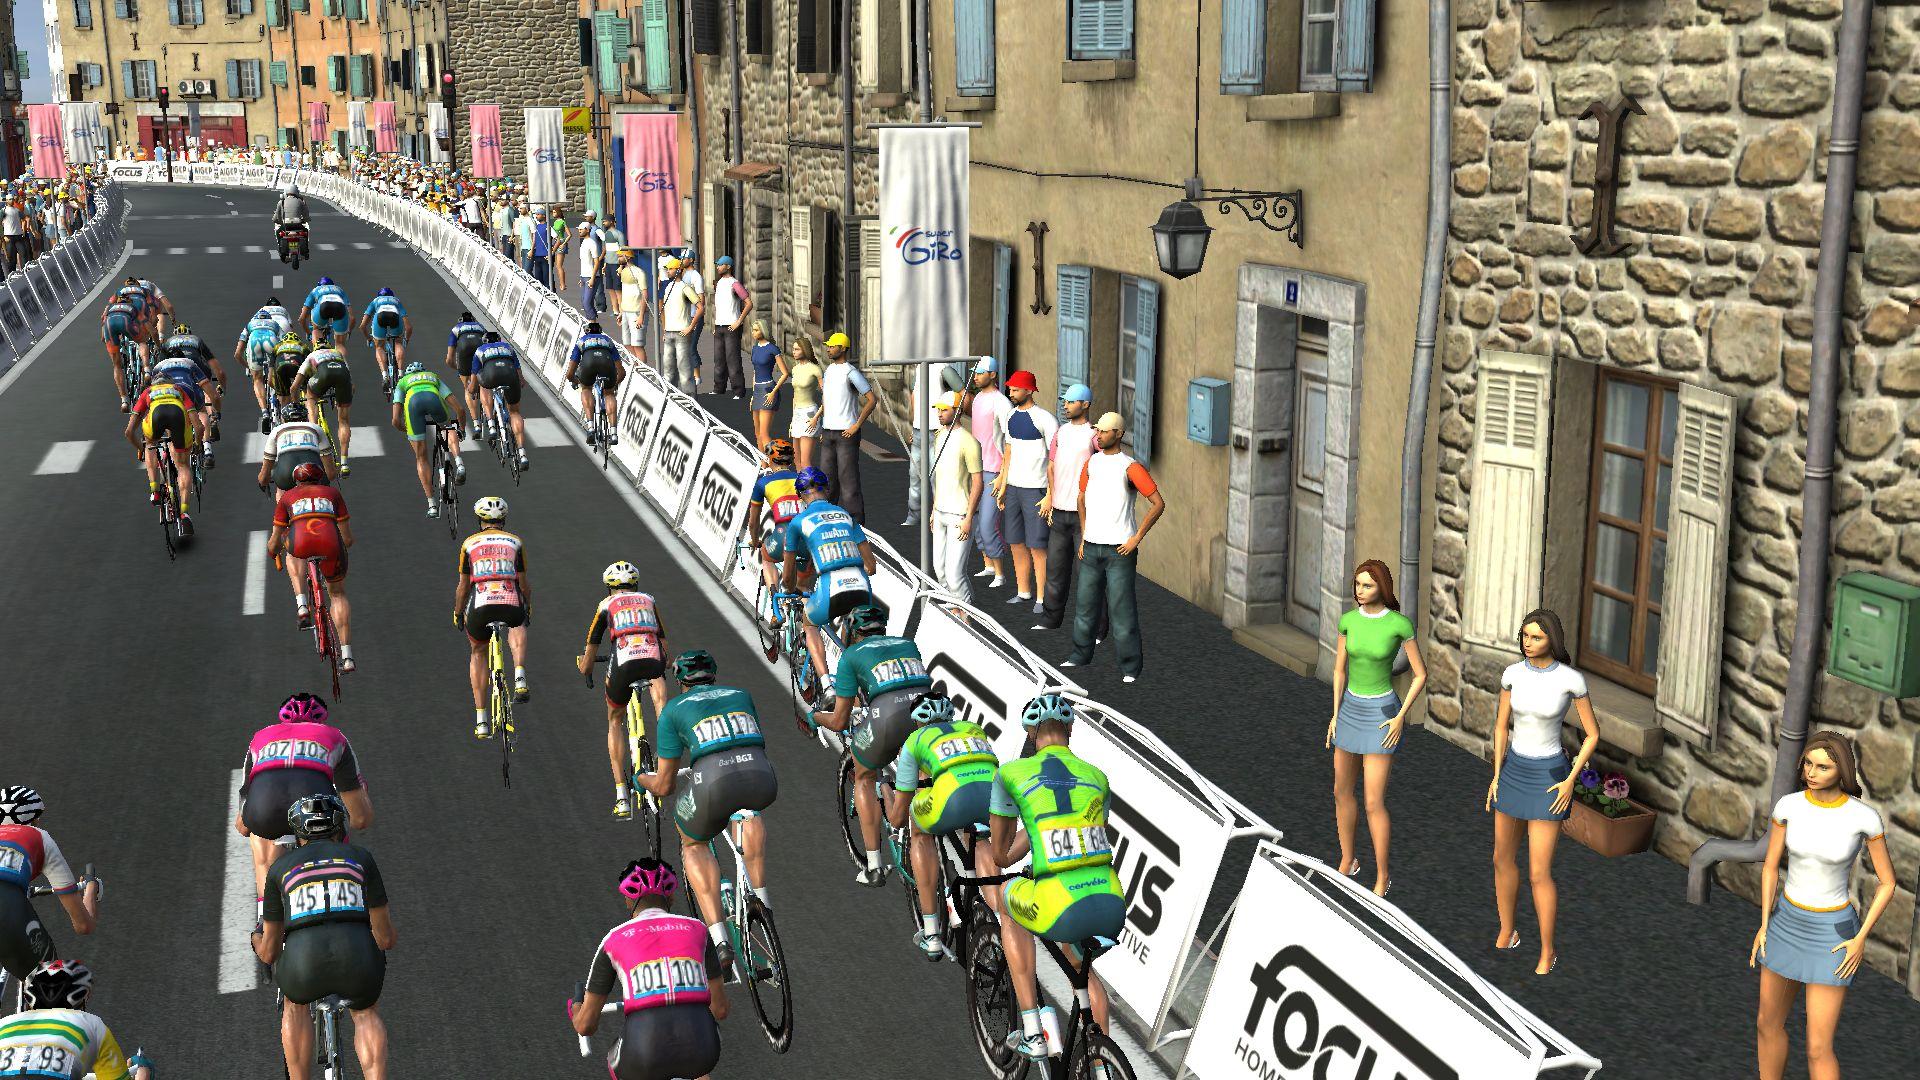 pcmdaily.com/images/mg/2019/Races/GTM/Giro/mg19_giro_10_PCM0130.jpg